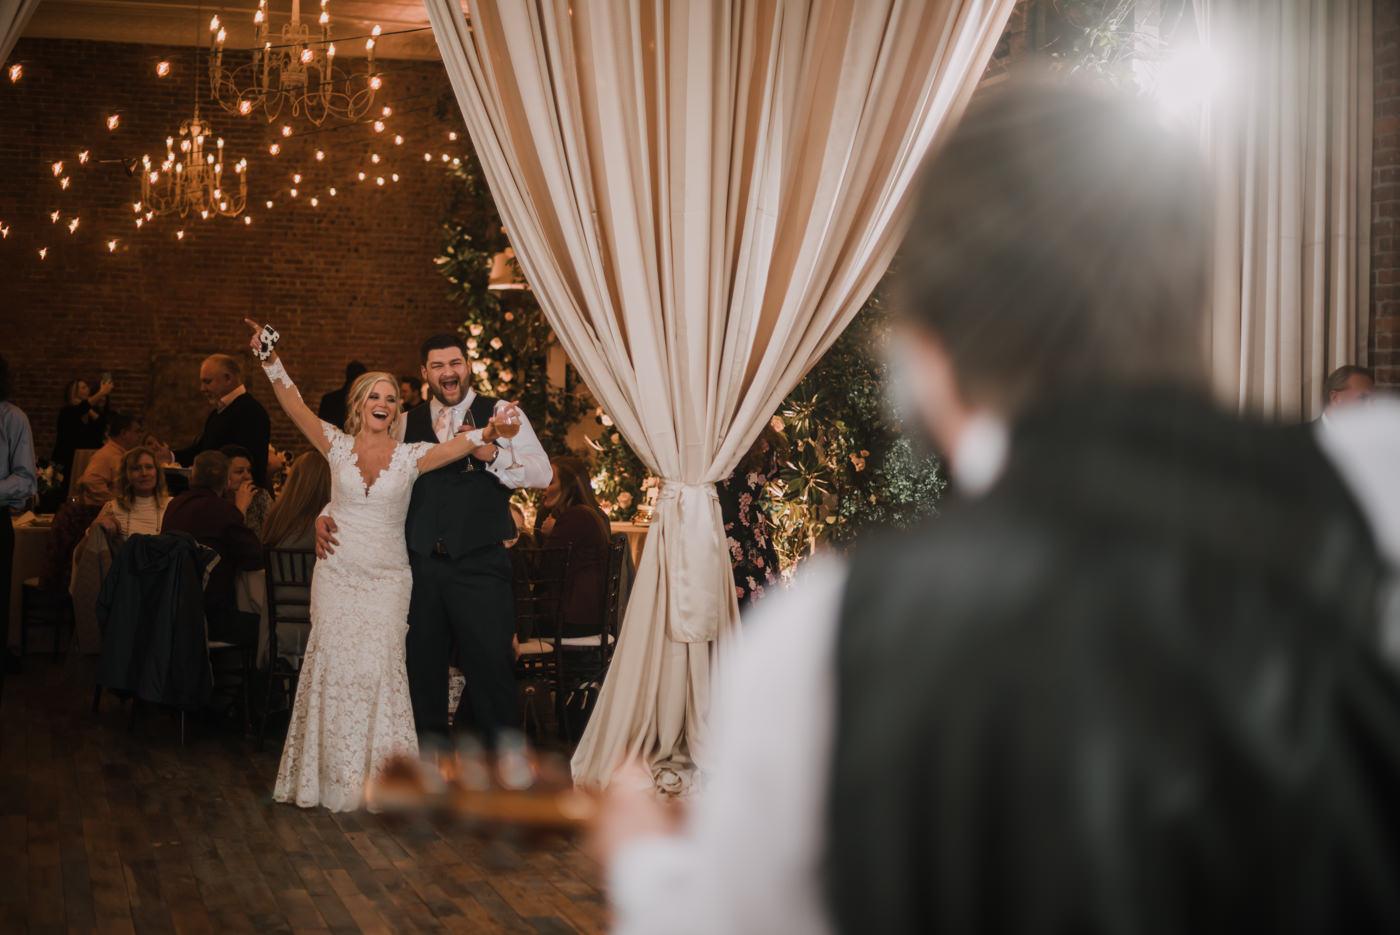 ravington.wedding.northwestarkansas.mileswittboyer-37.jpg